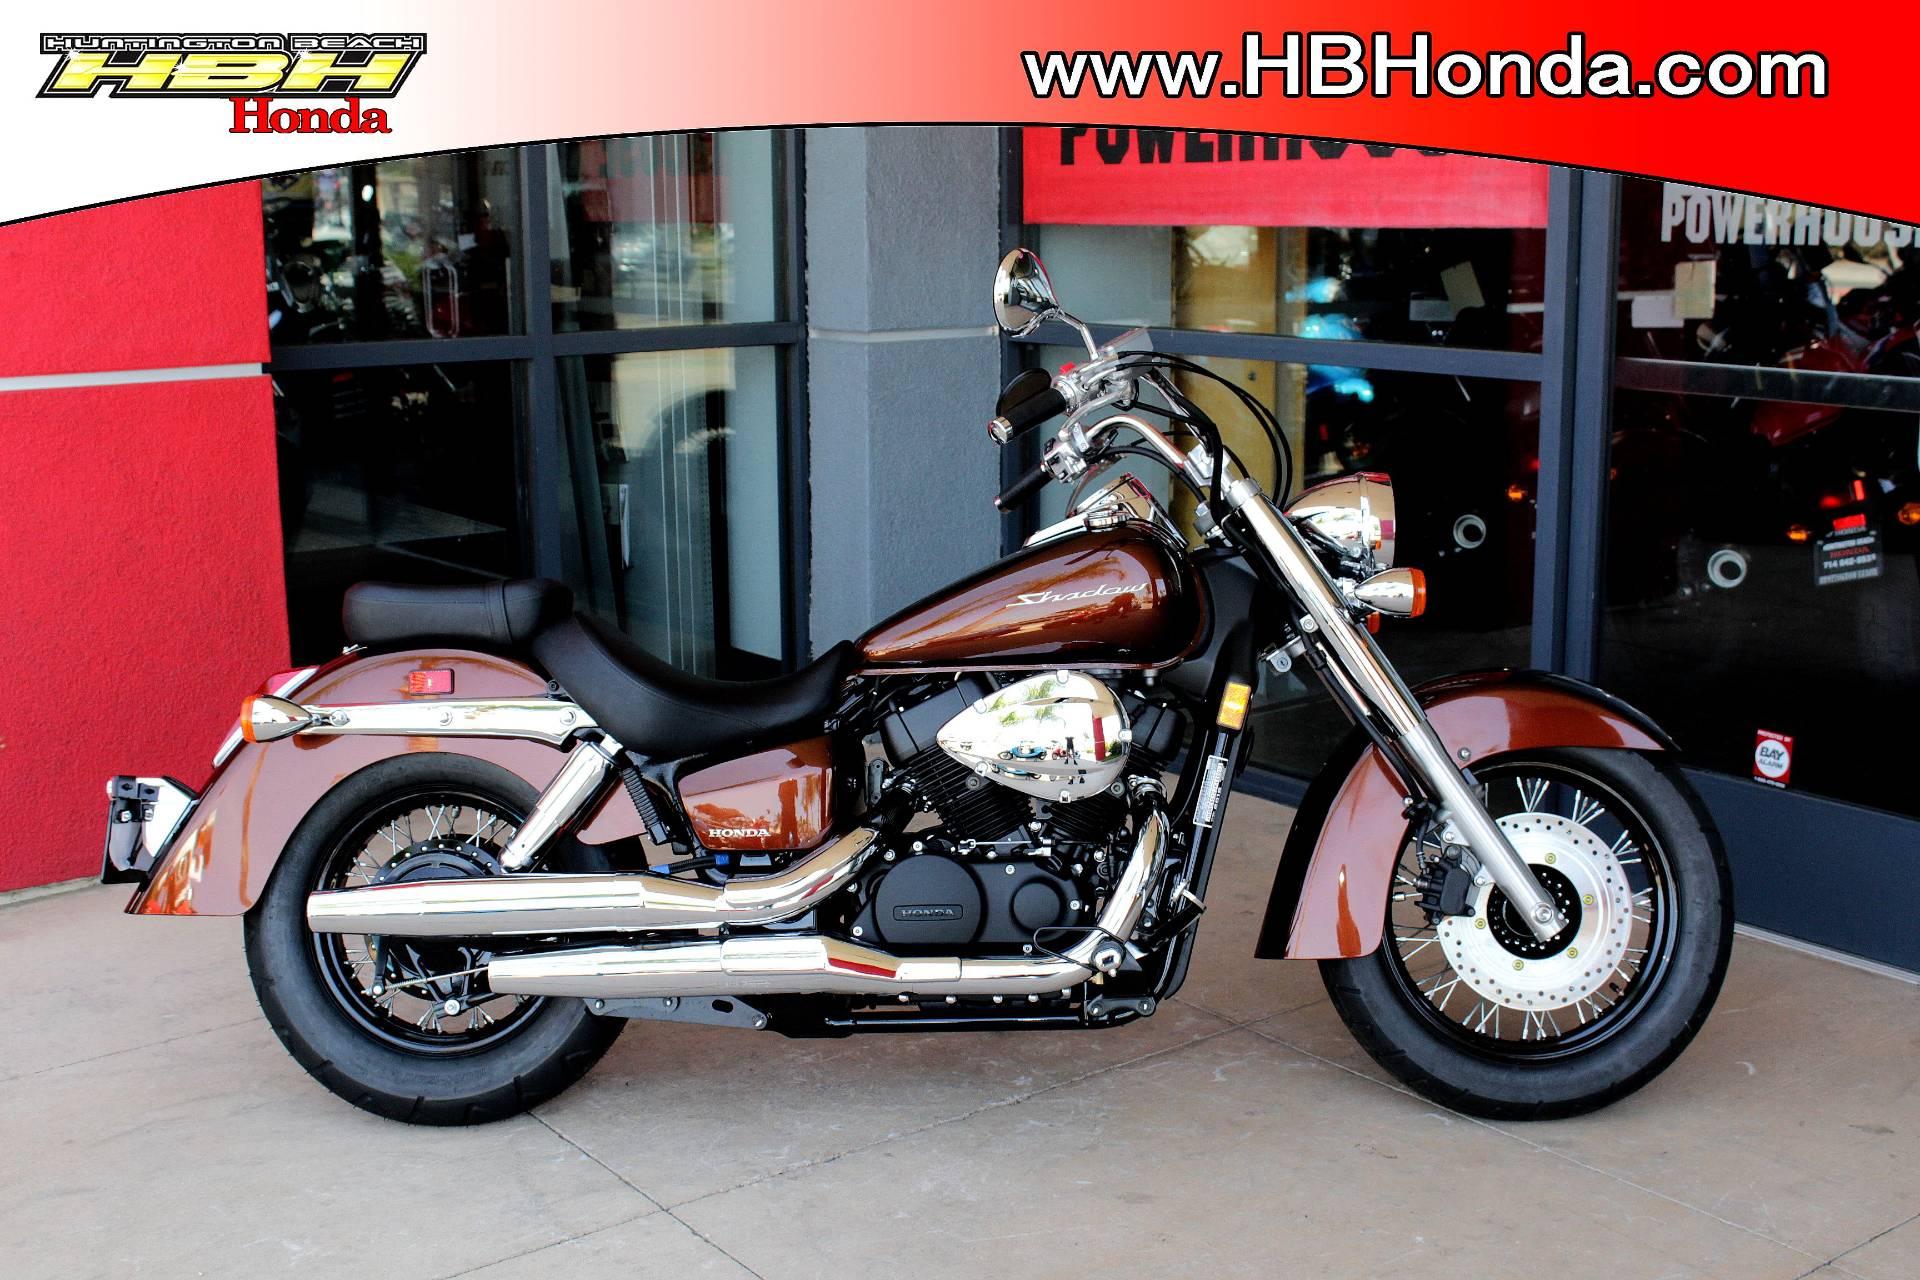 New 2018 Honda Shadow Aero 750 Motorcycles for sale in Huntington ...